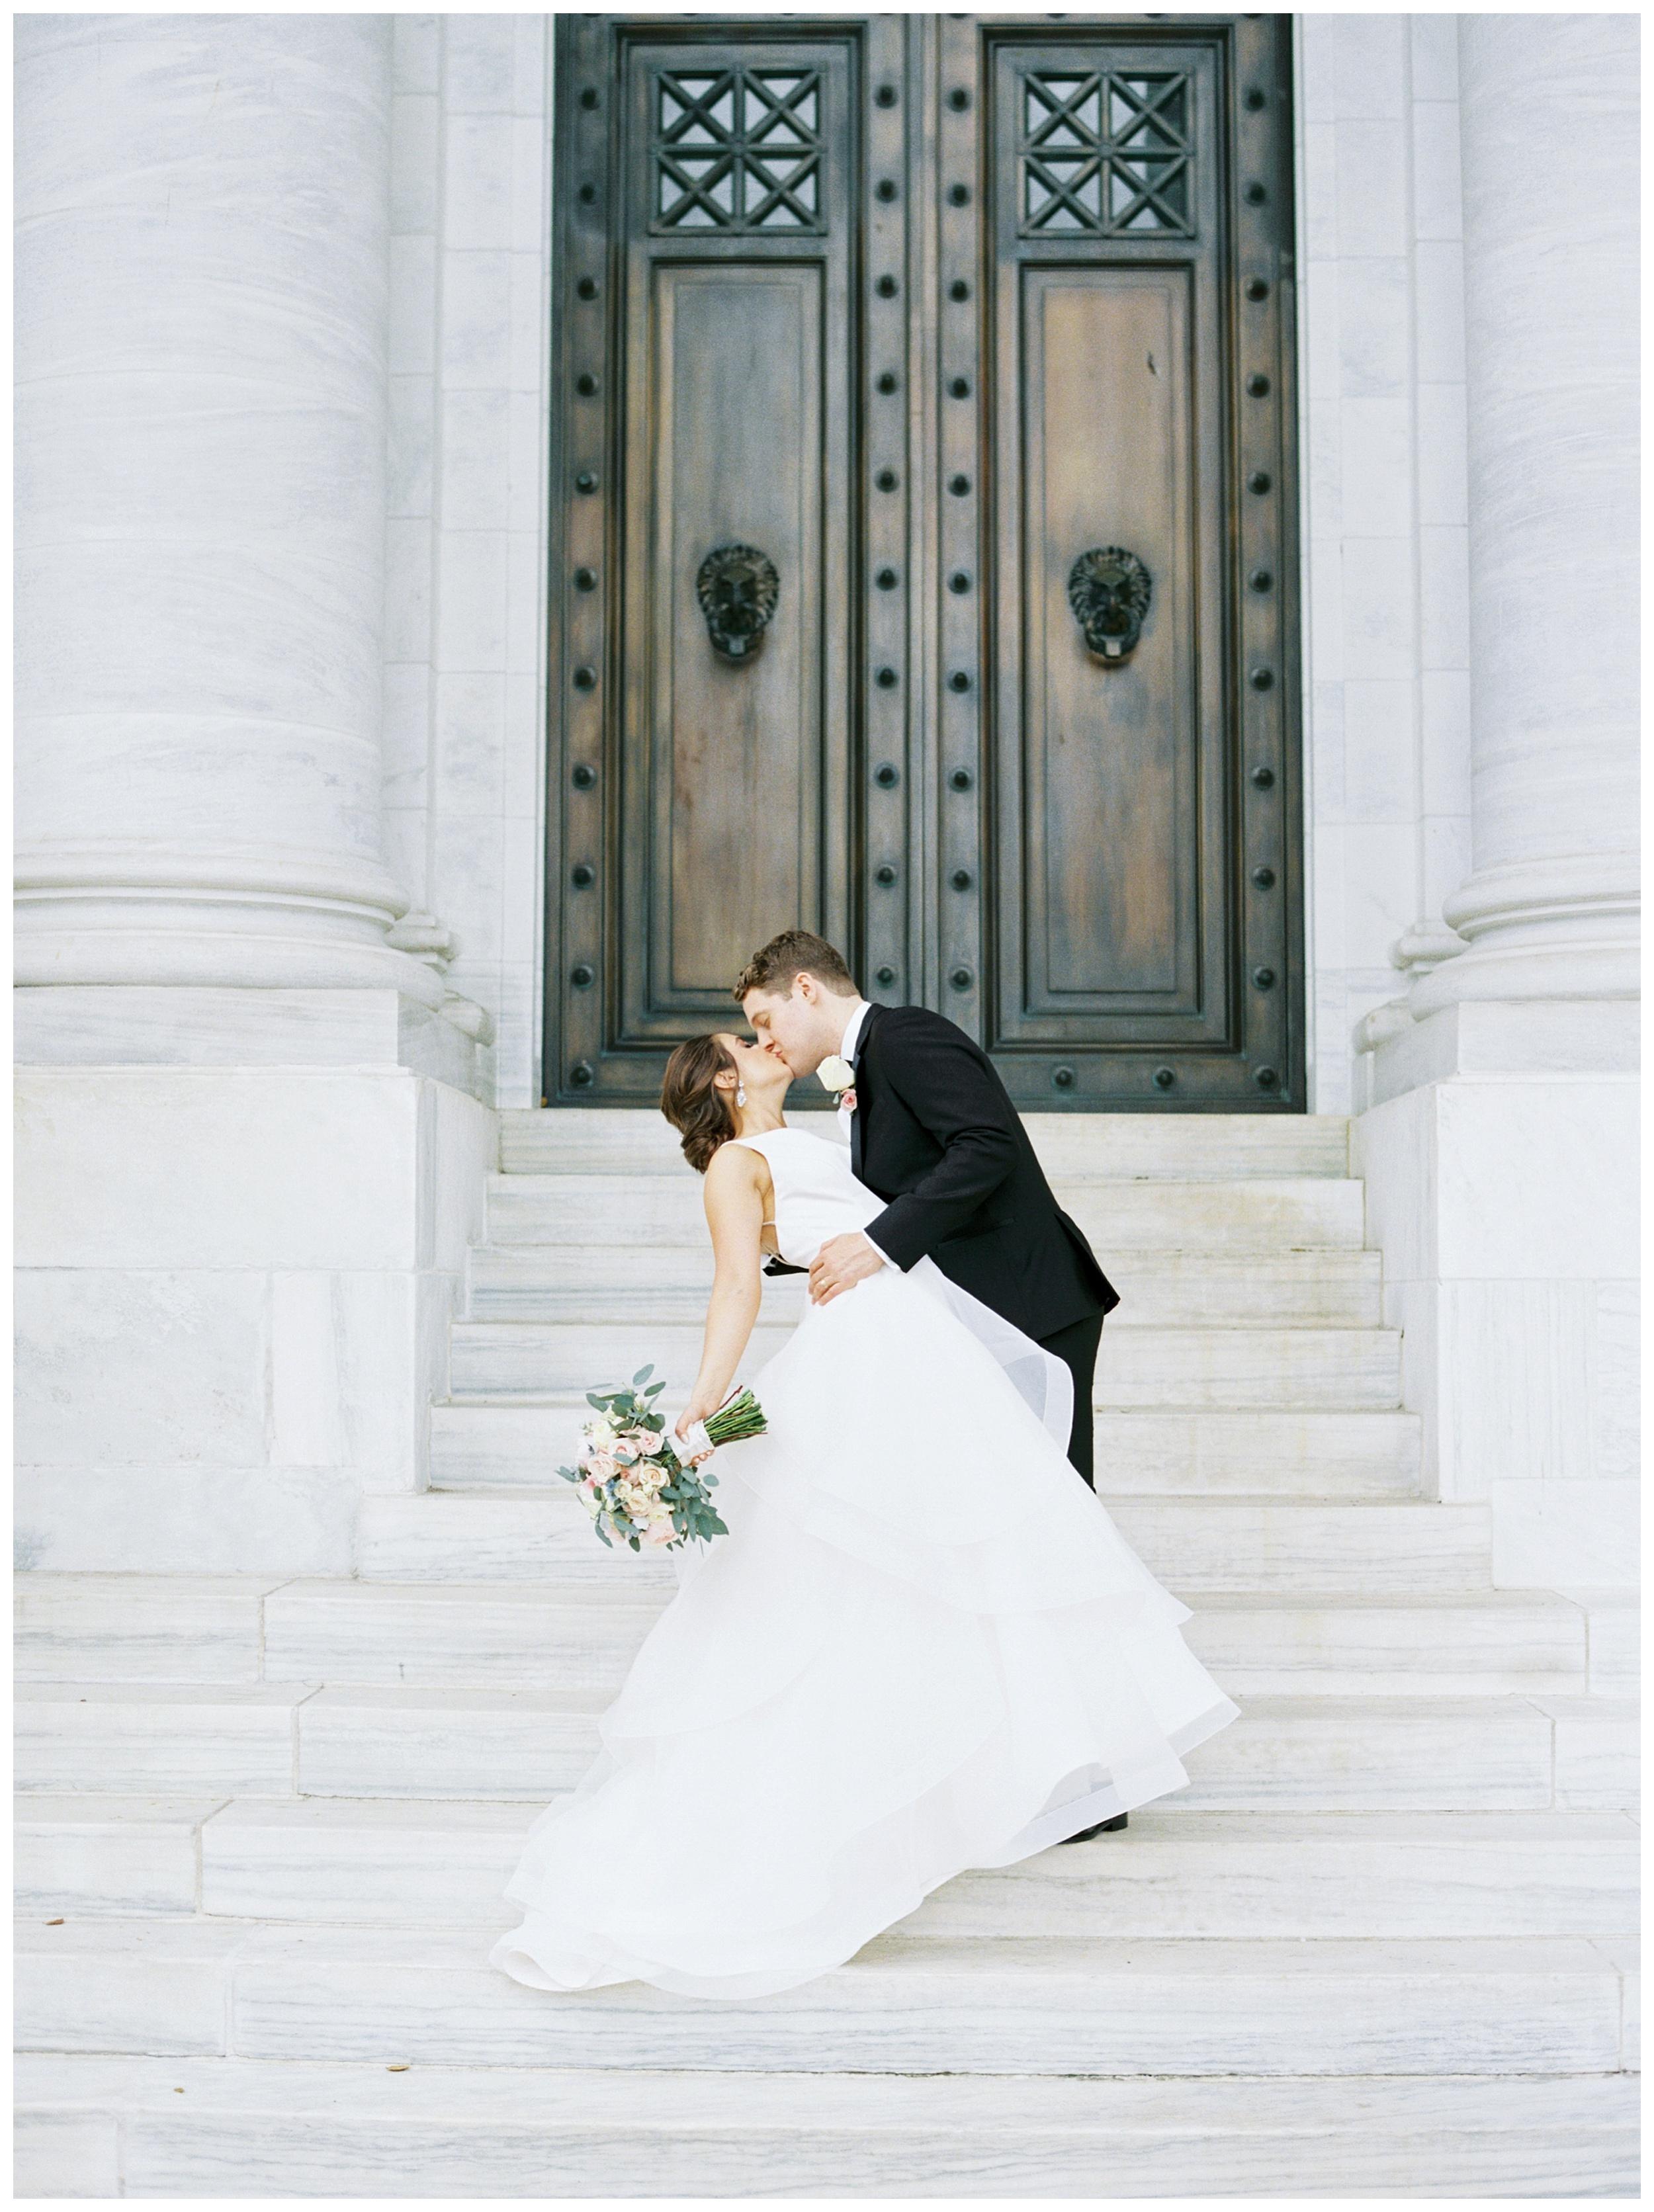 DAR Constitution Hall Wedding Wedding | Daughters of the American Revolution Wedding | District of Columbia Film Wedding Photographer Kir Tuben_0115.jpg